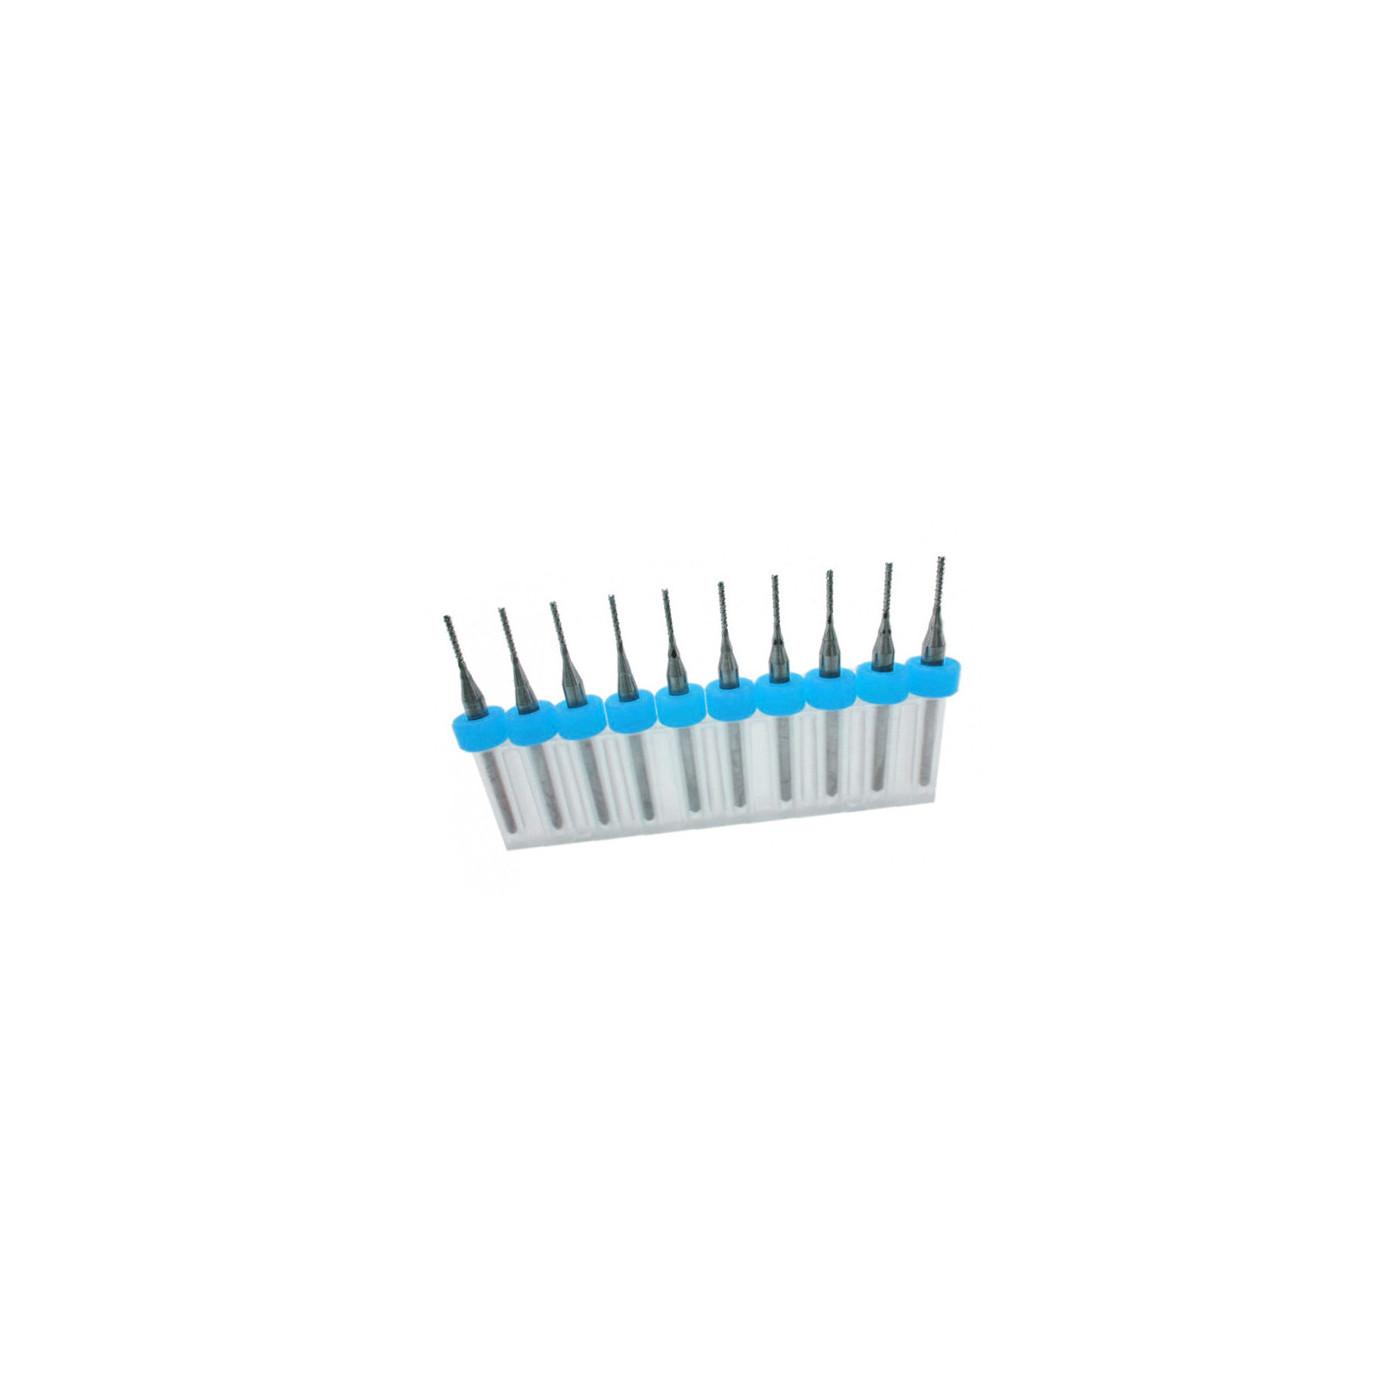 Conjunto de 10 fresa de micro-fresadoras (0,80 mm)  - 1